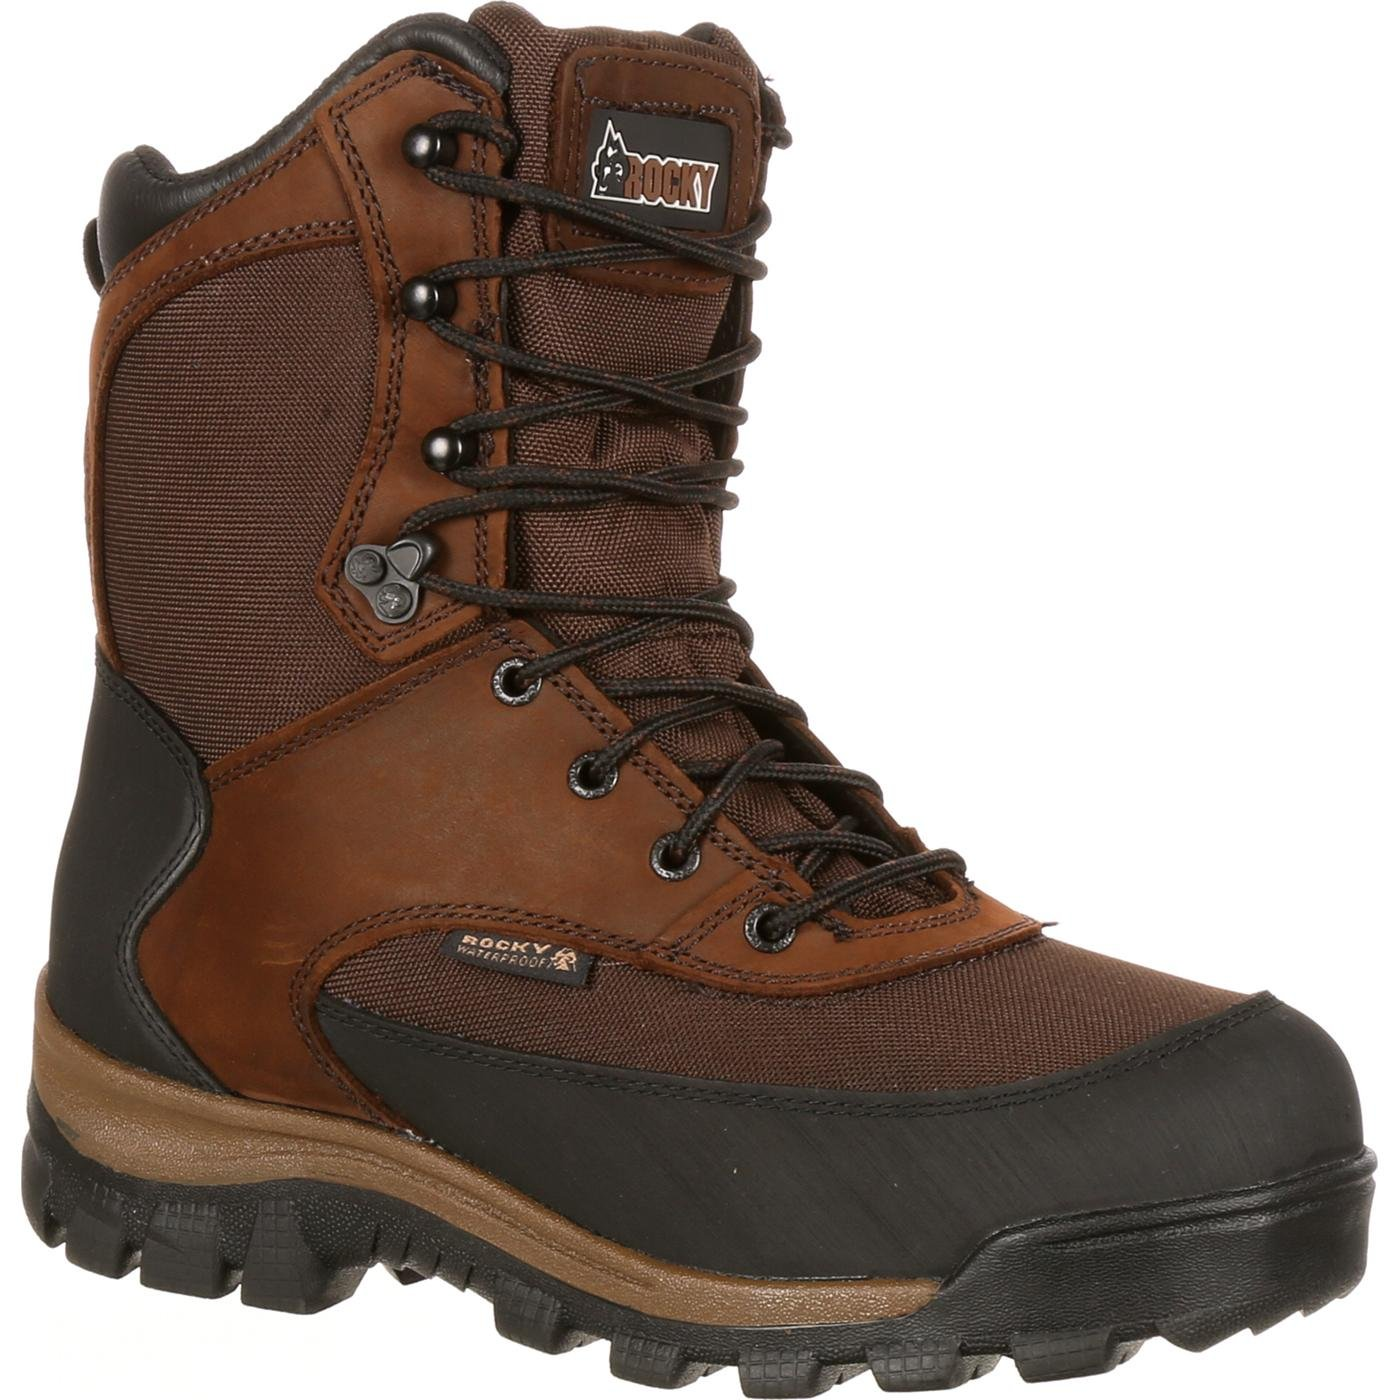 Rocky Men's FQ0004753 Mid Calf Boot, Dark Brown, 11.5 W US